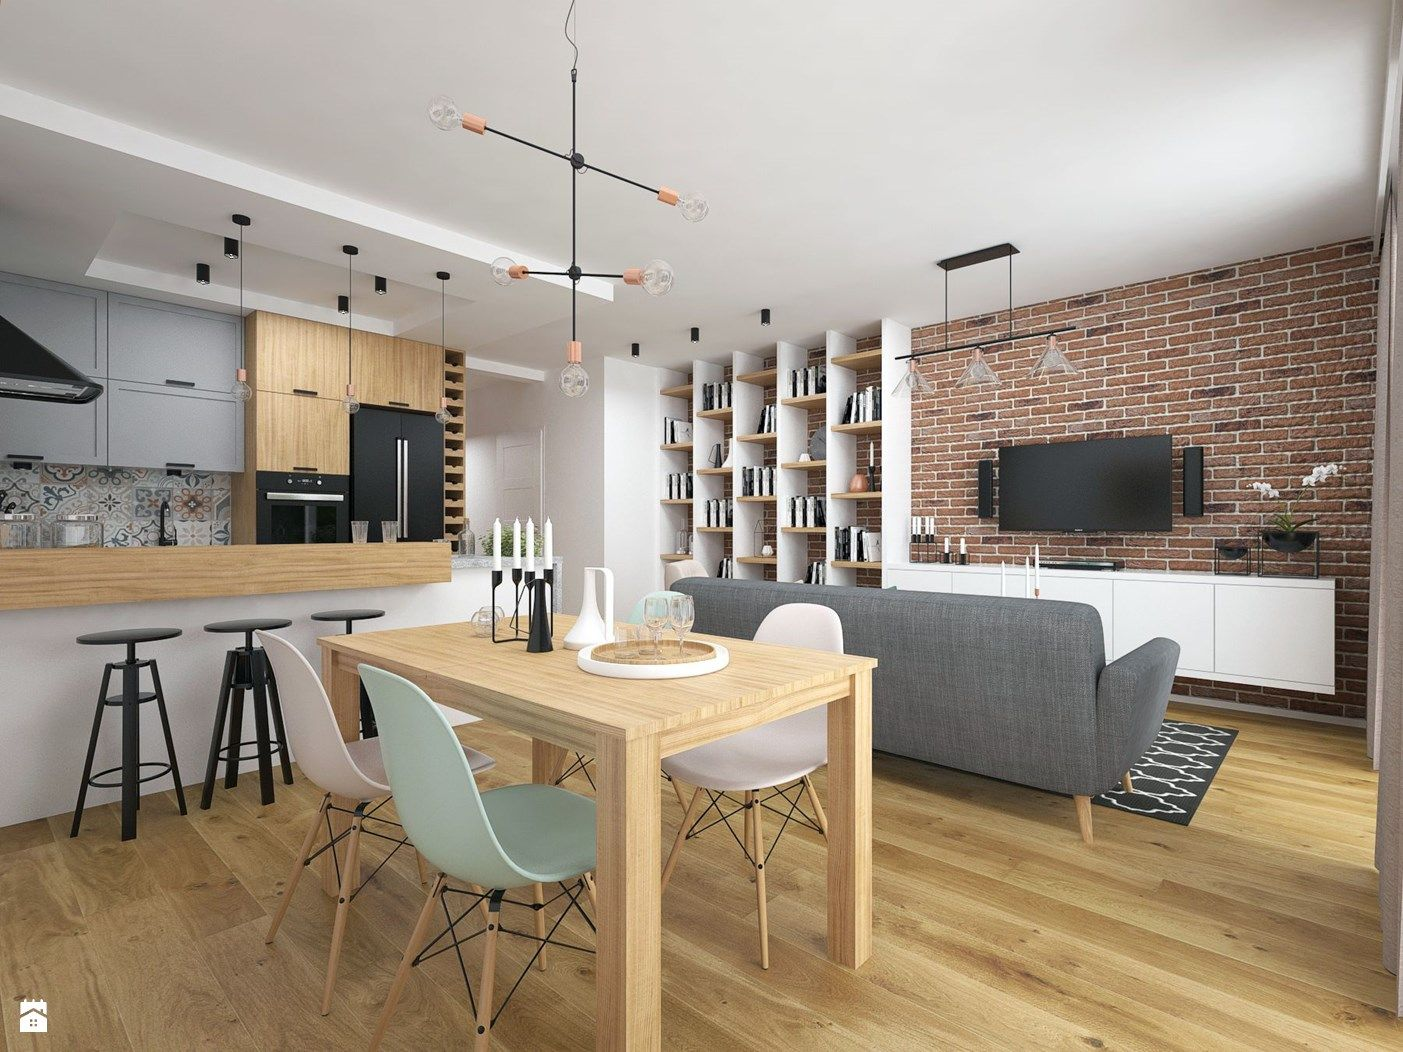 Lovely Studio Apartment Kitchen Table